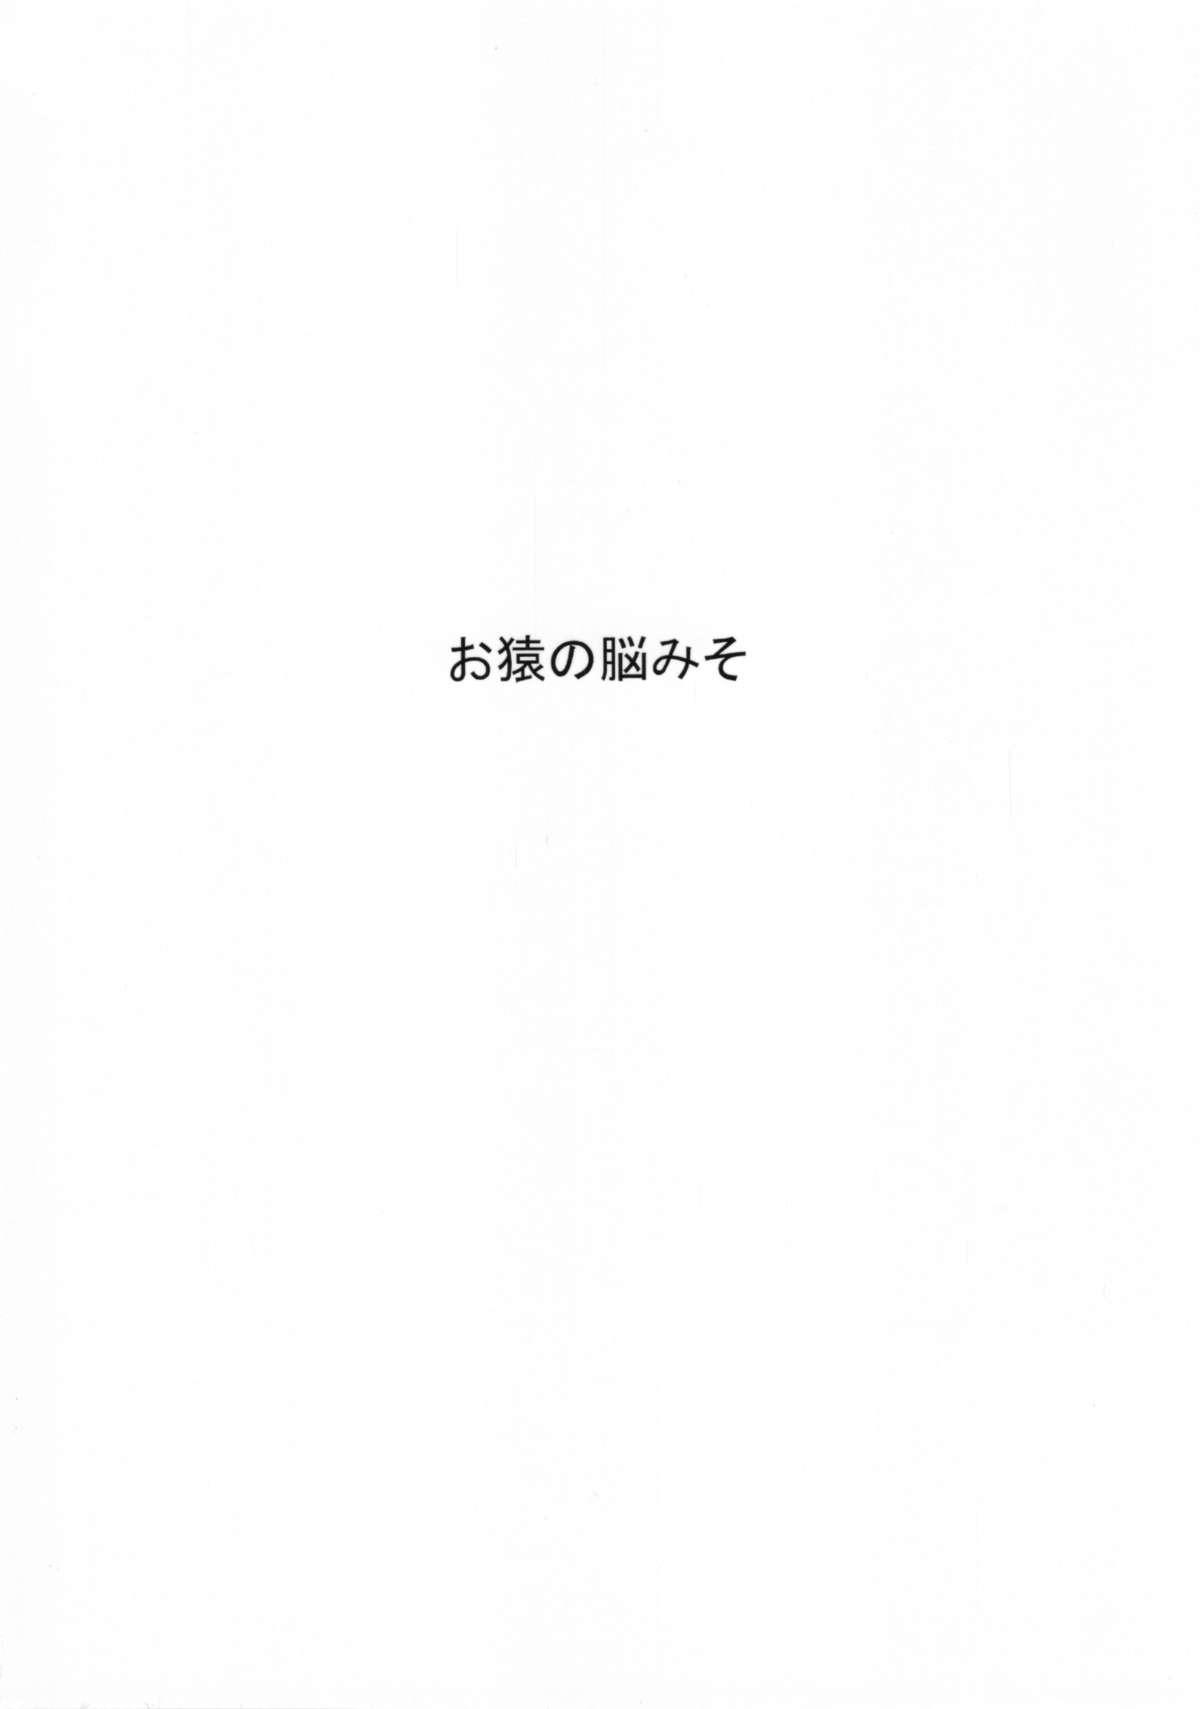 Girigiri Idol 2 22